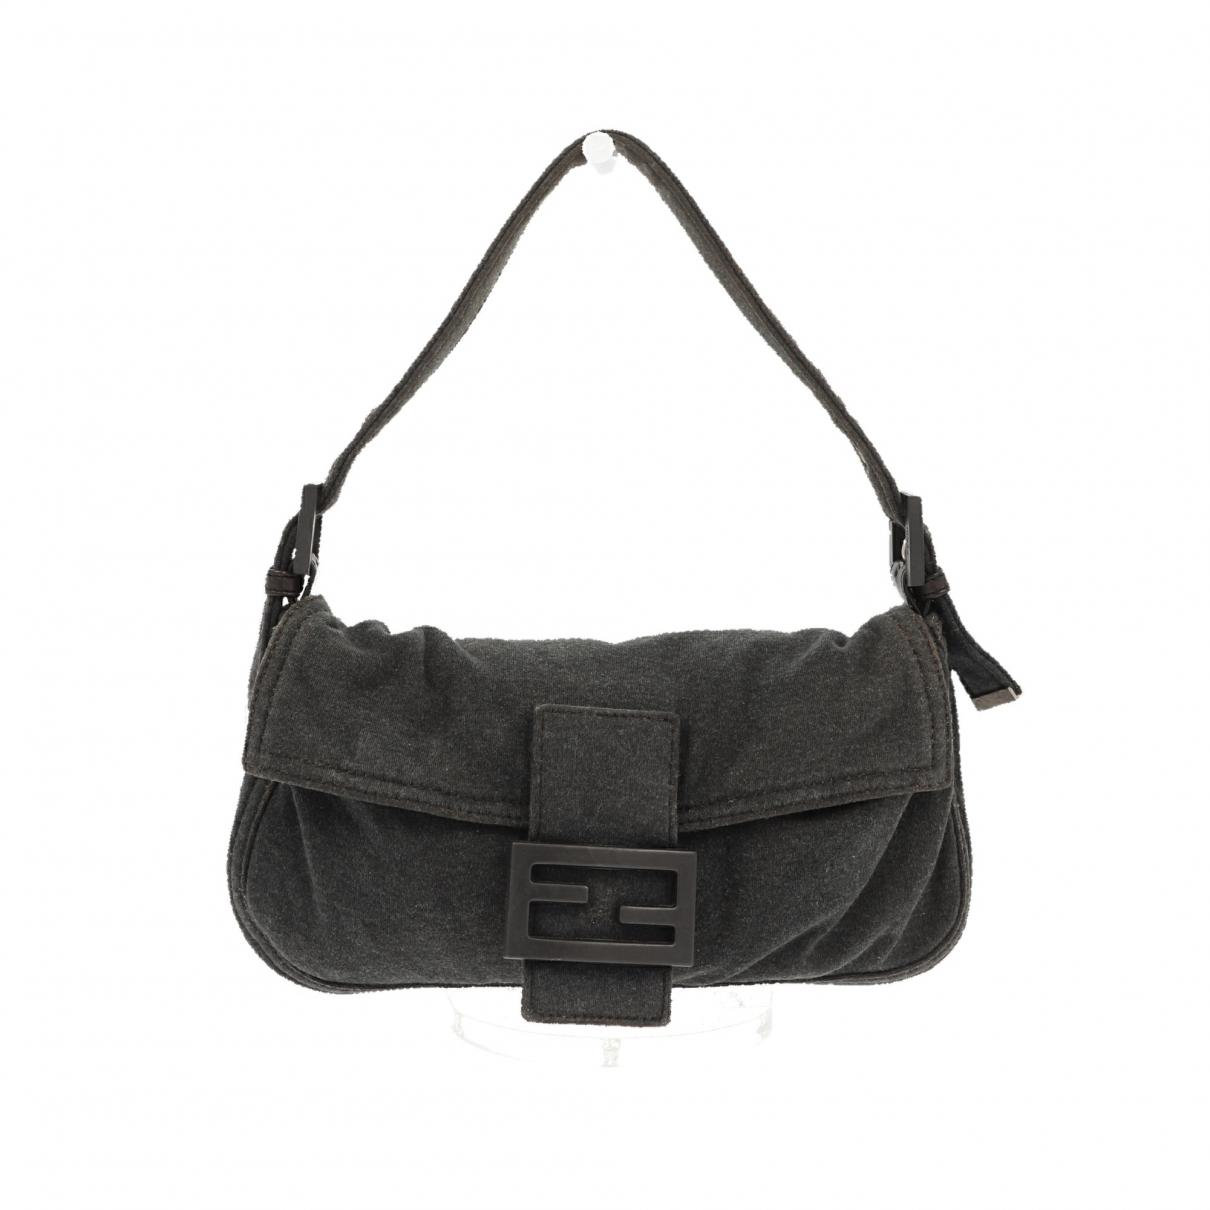 Fendi Baguette Handtasche in  Grau Leinen